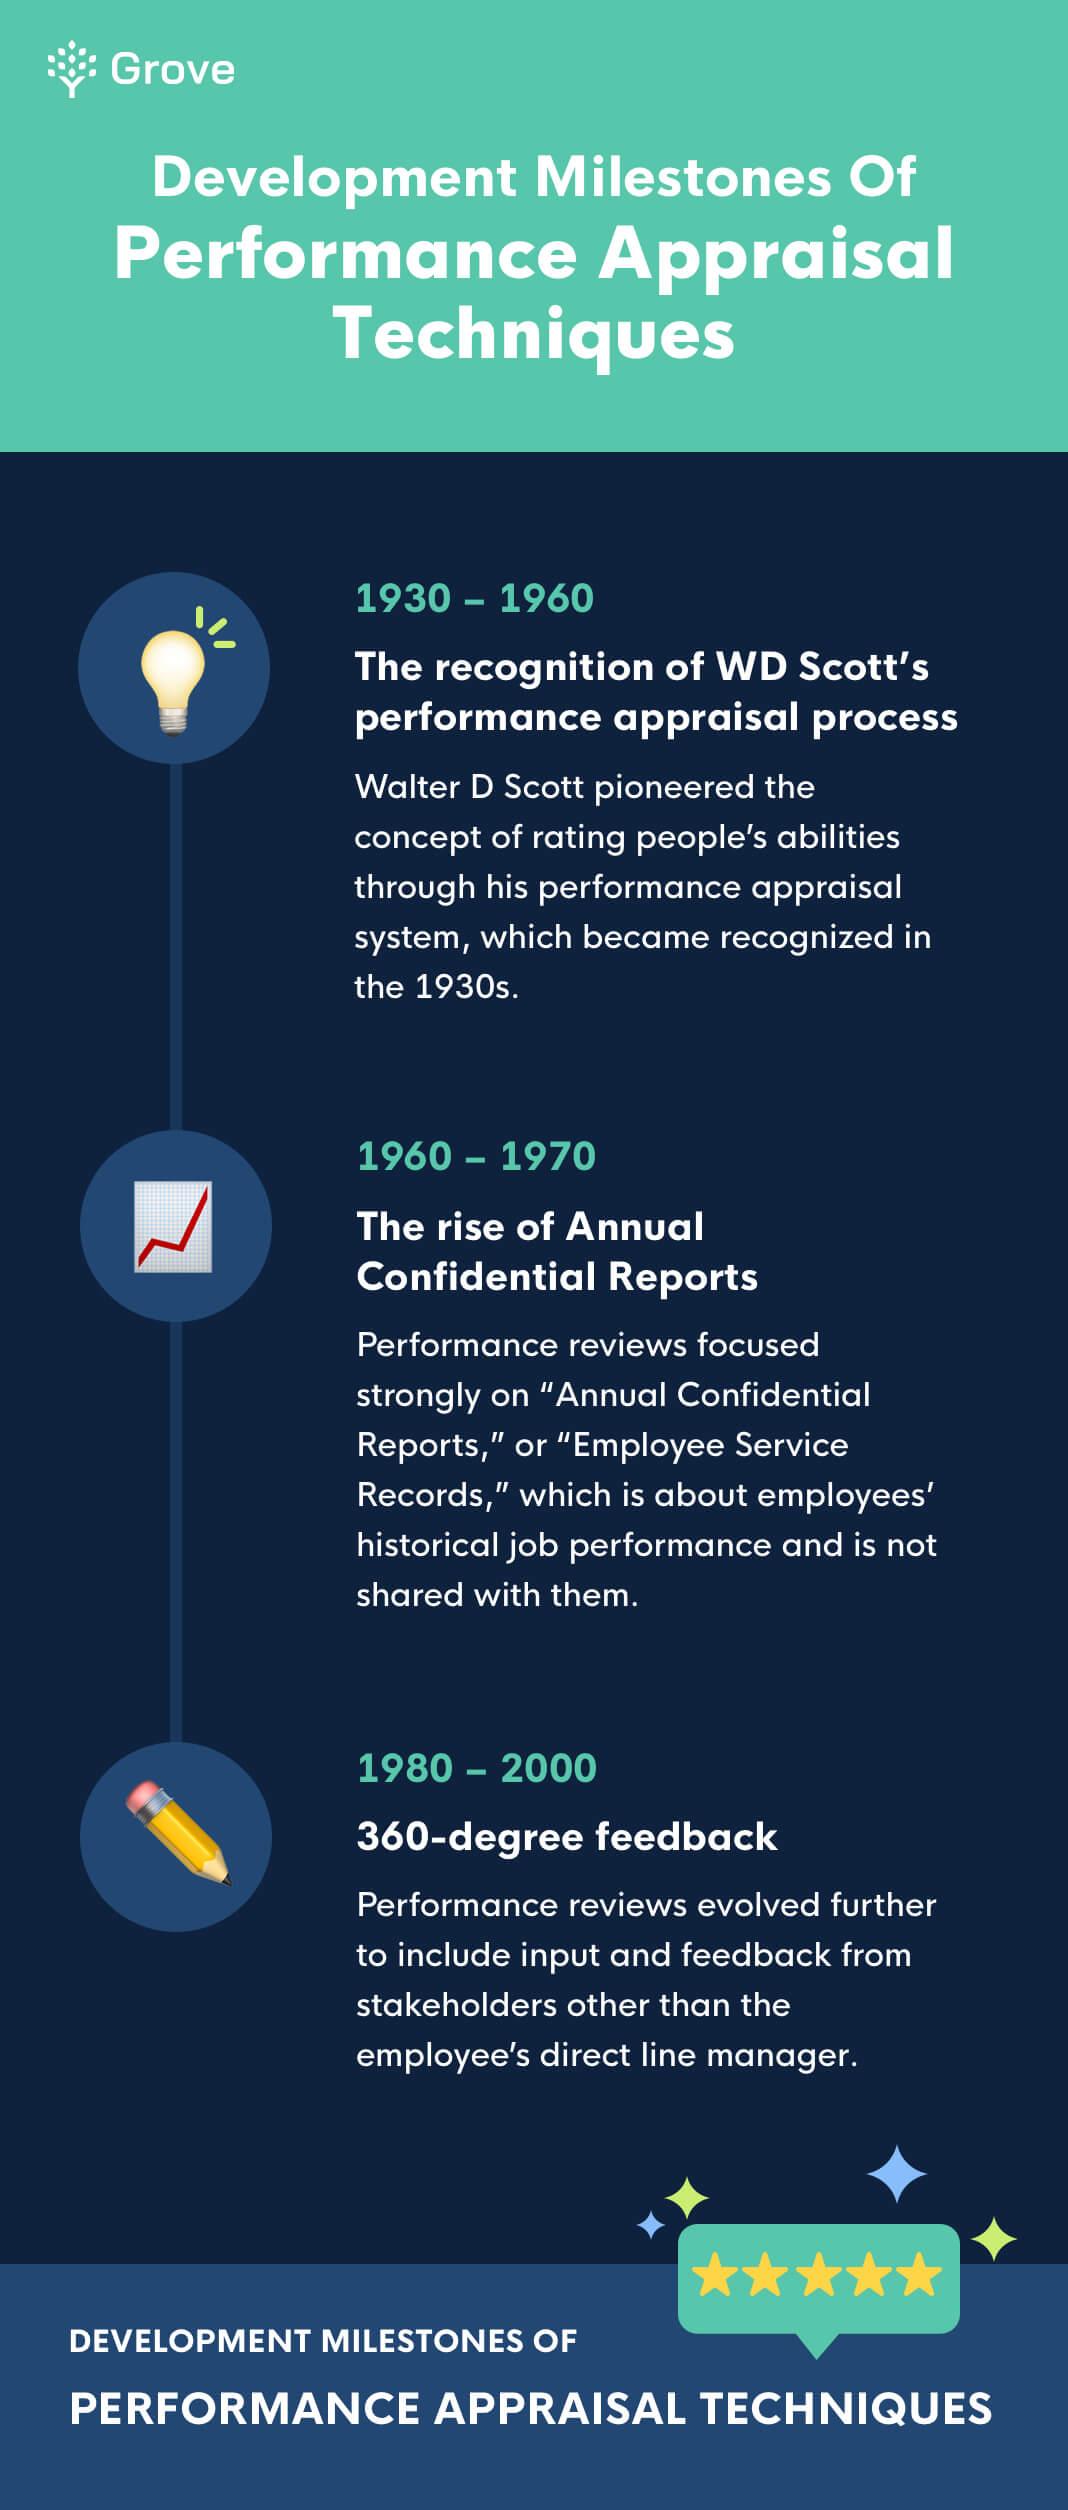 Grove HR - Development milestones of performance reviews infographic